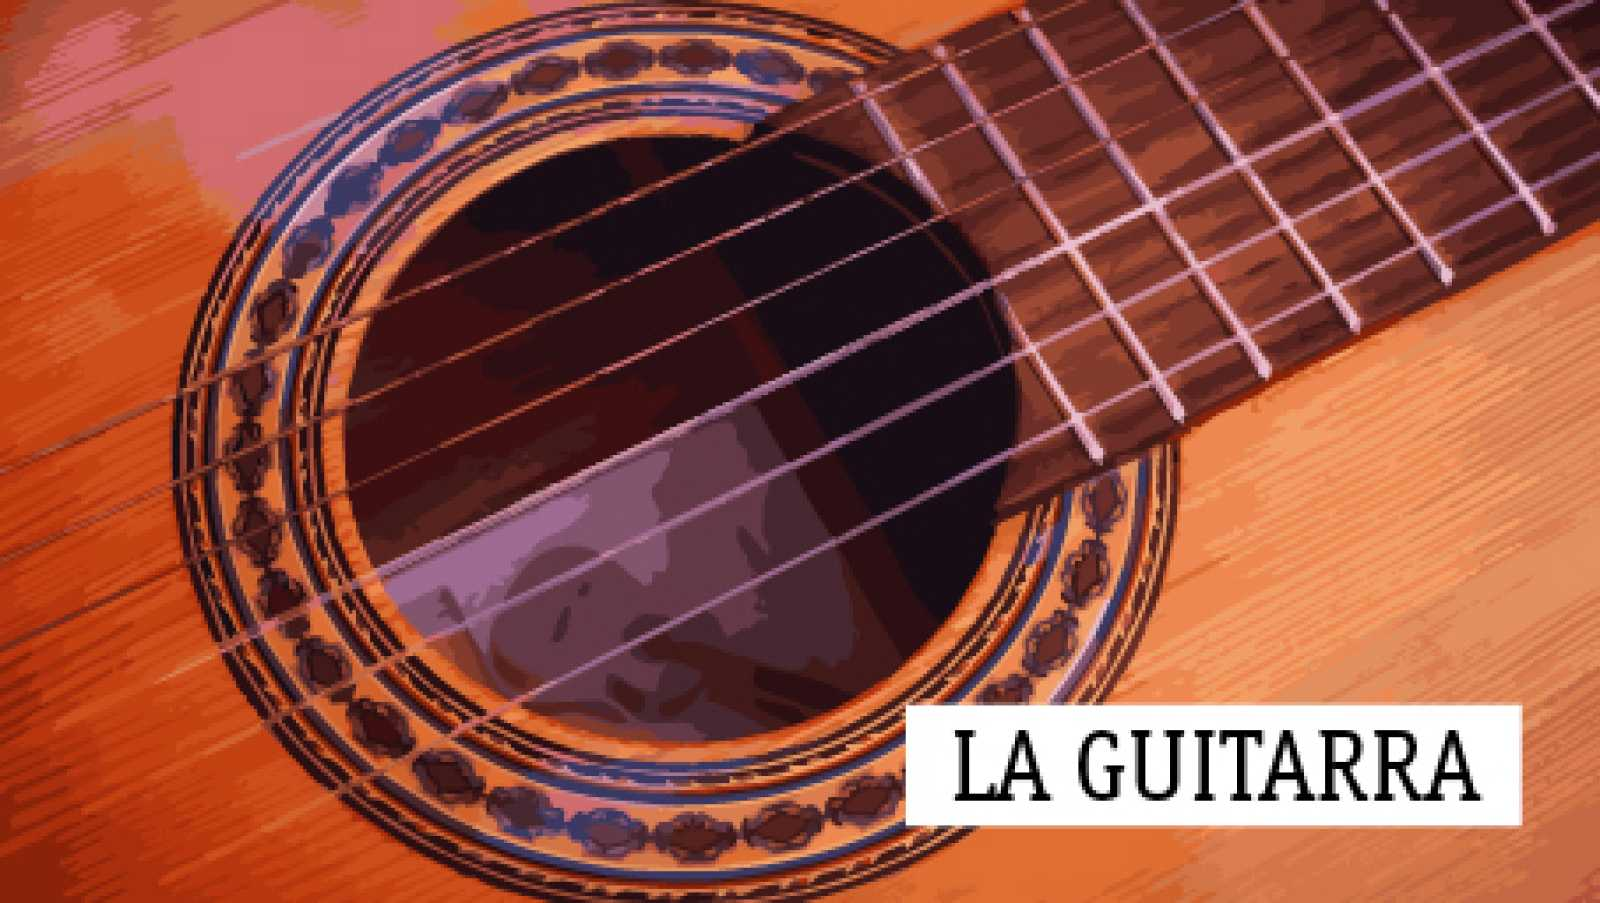 La guitarra - Nirse González - 24/02/19 - escuchar ahora